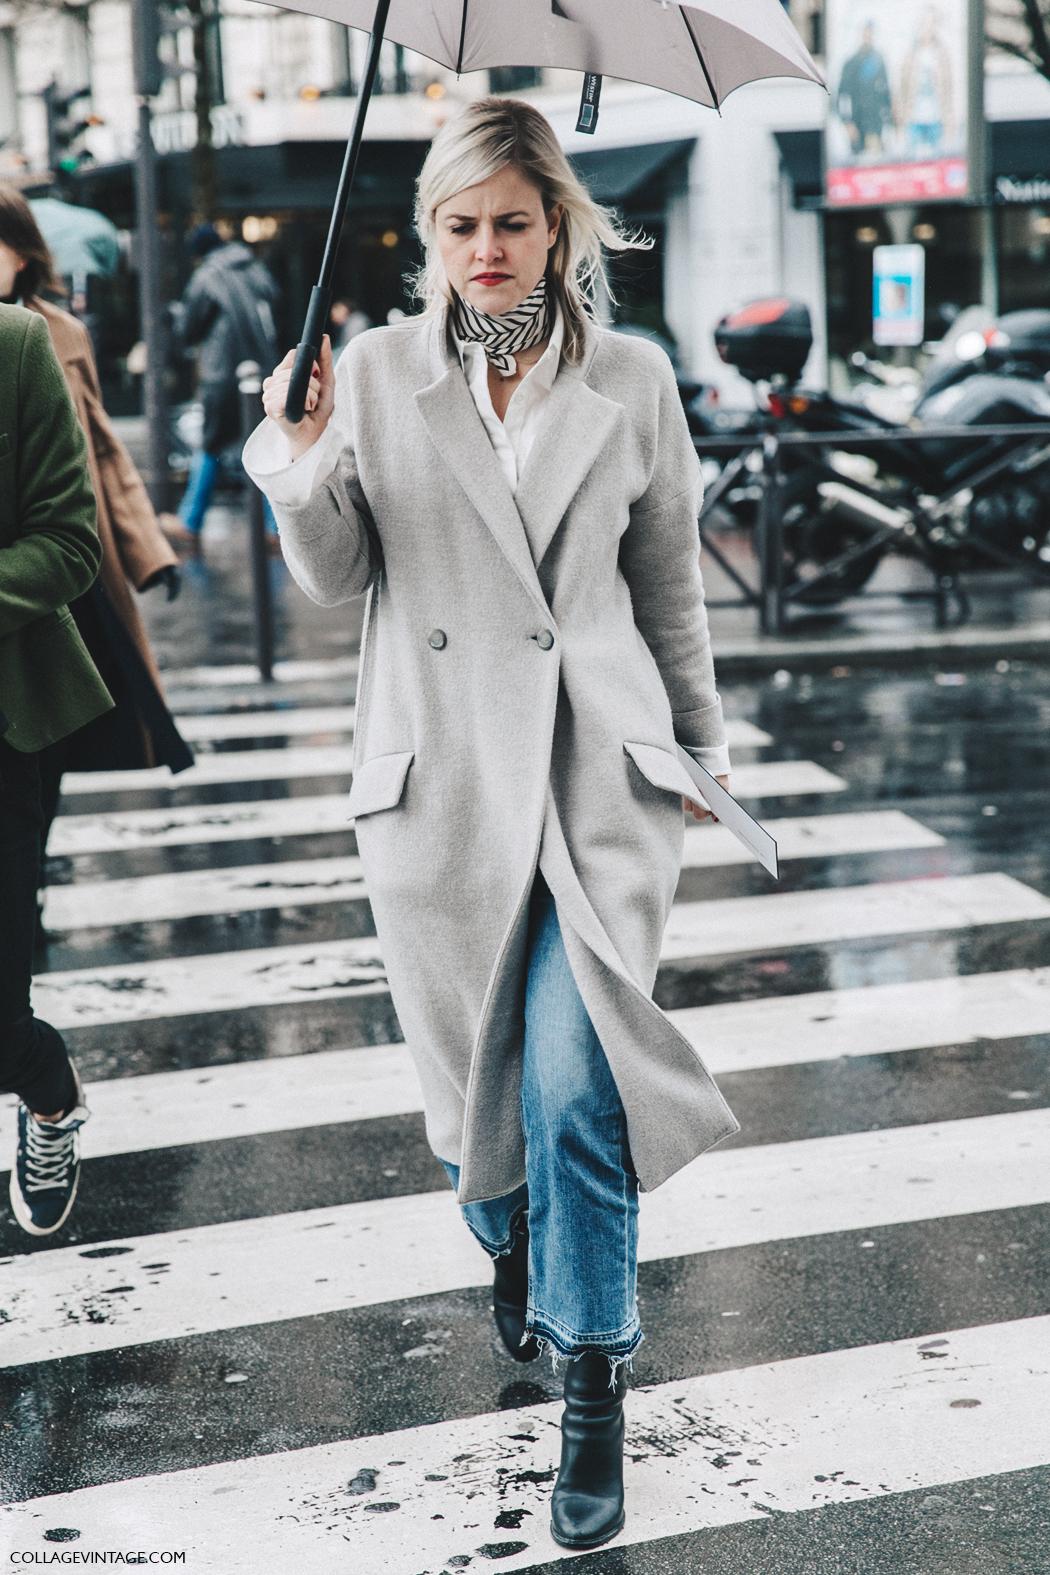 PFW-Paris_Fashion_Week_Fall_2016-Street_Style-Collage_Vintage-Grey_Coat-